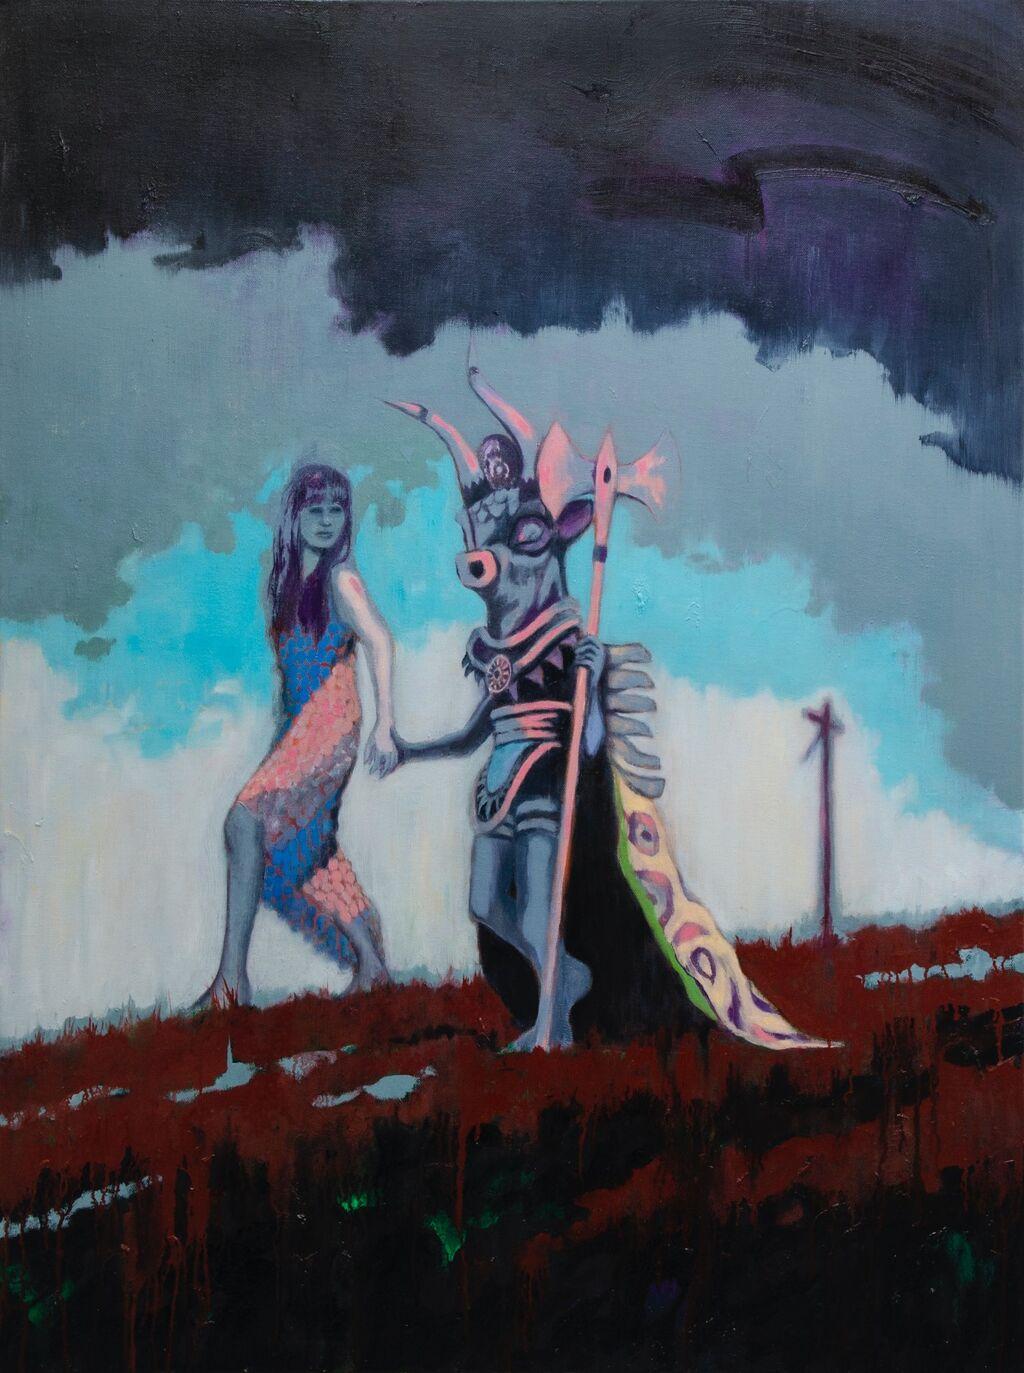 'She Took the Hand of the Boy Minotaur', 75 x 101 cm, oil on canvas